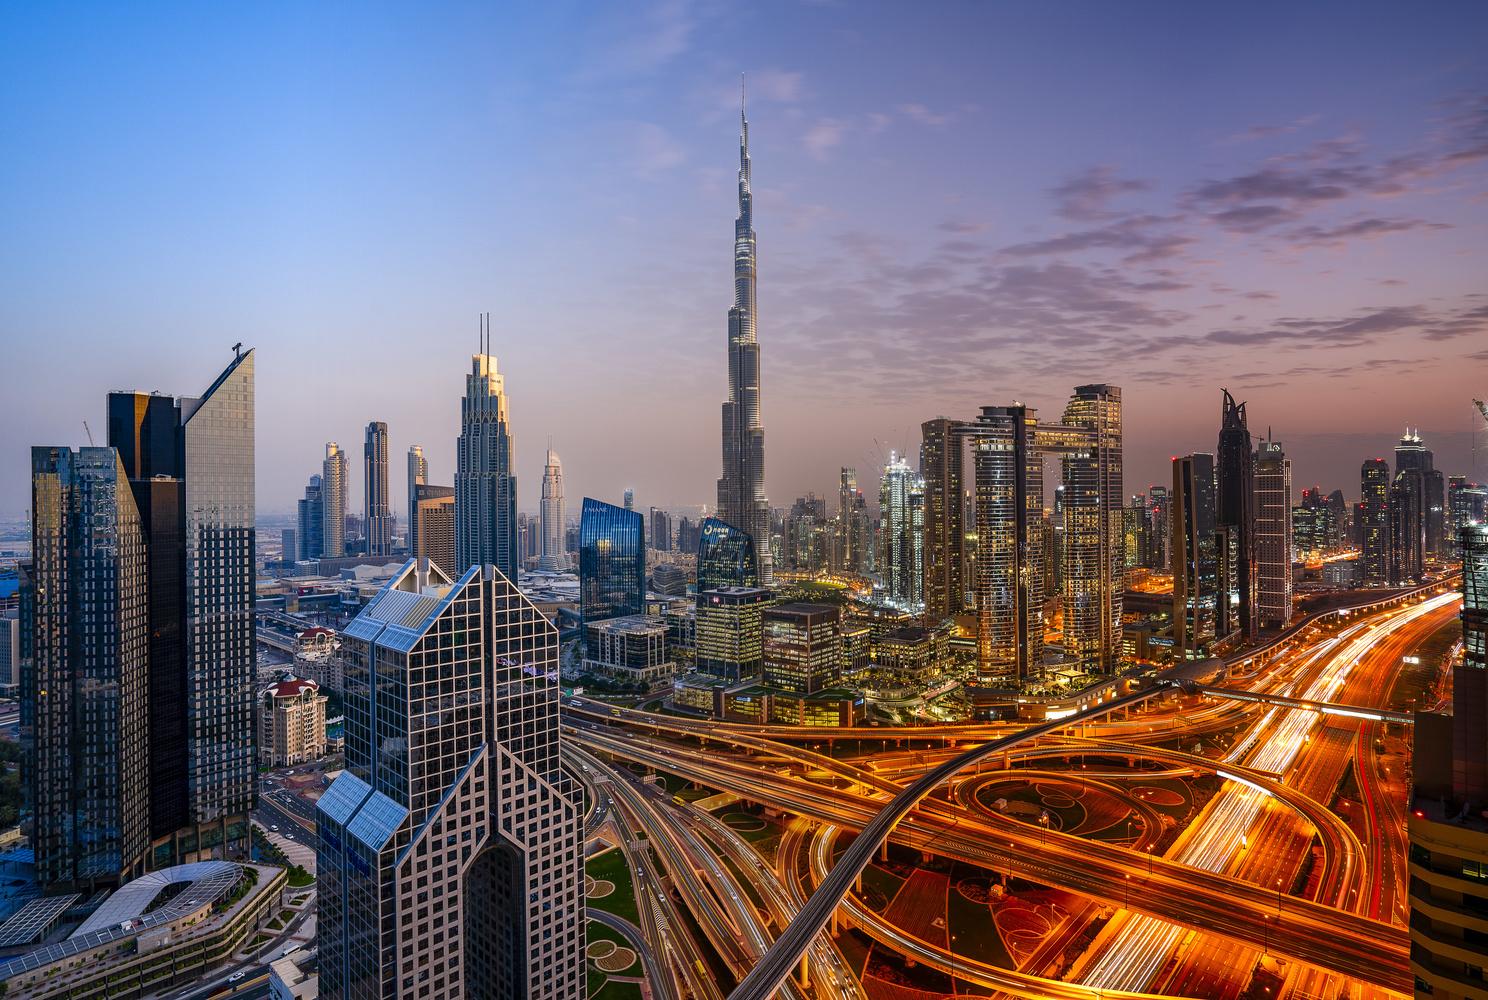 Downtown Dubai Day to Night by Ben Preece